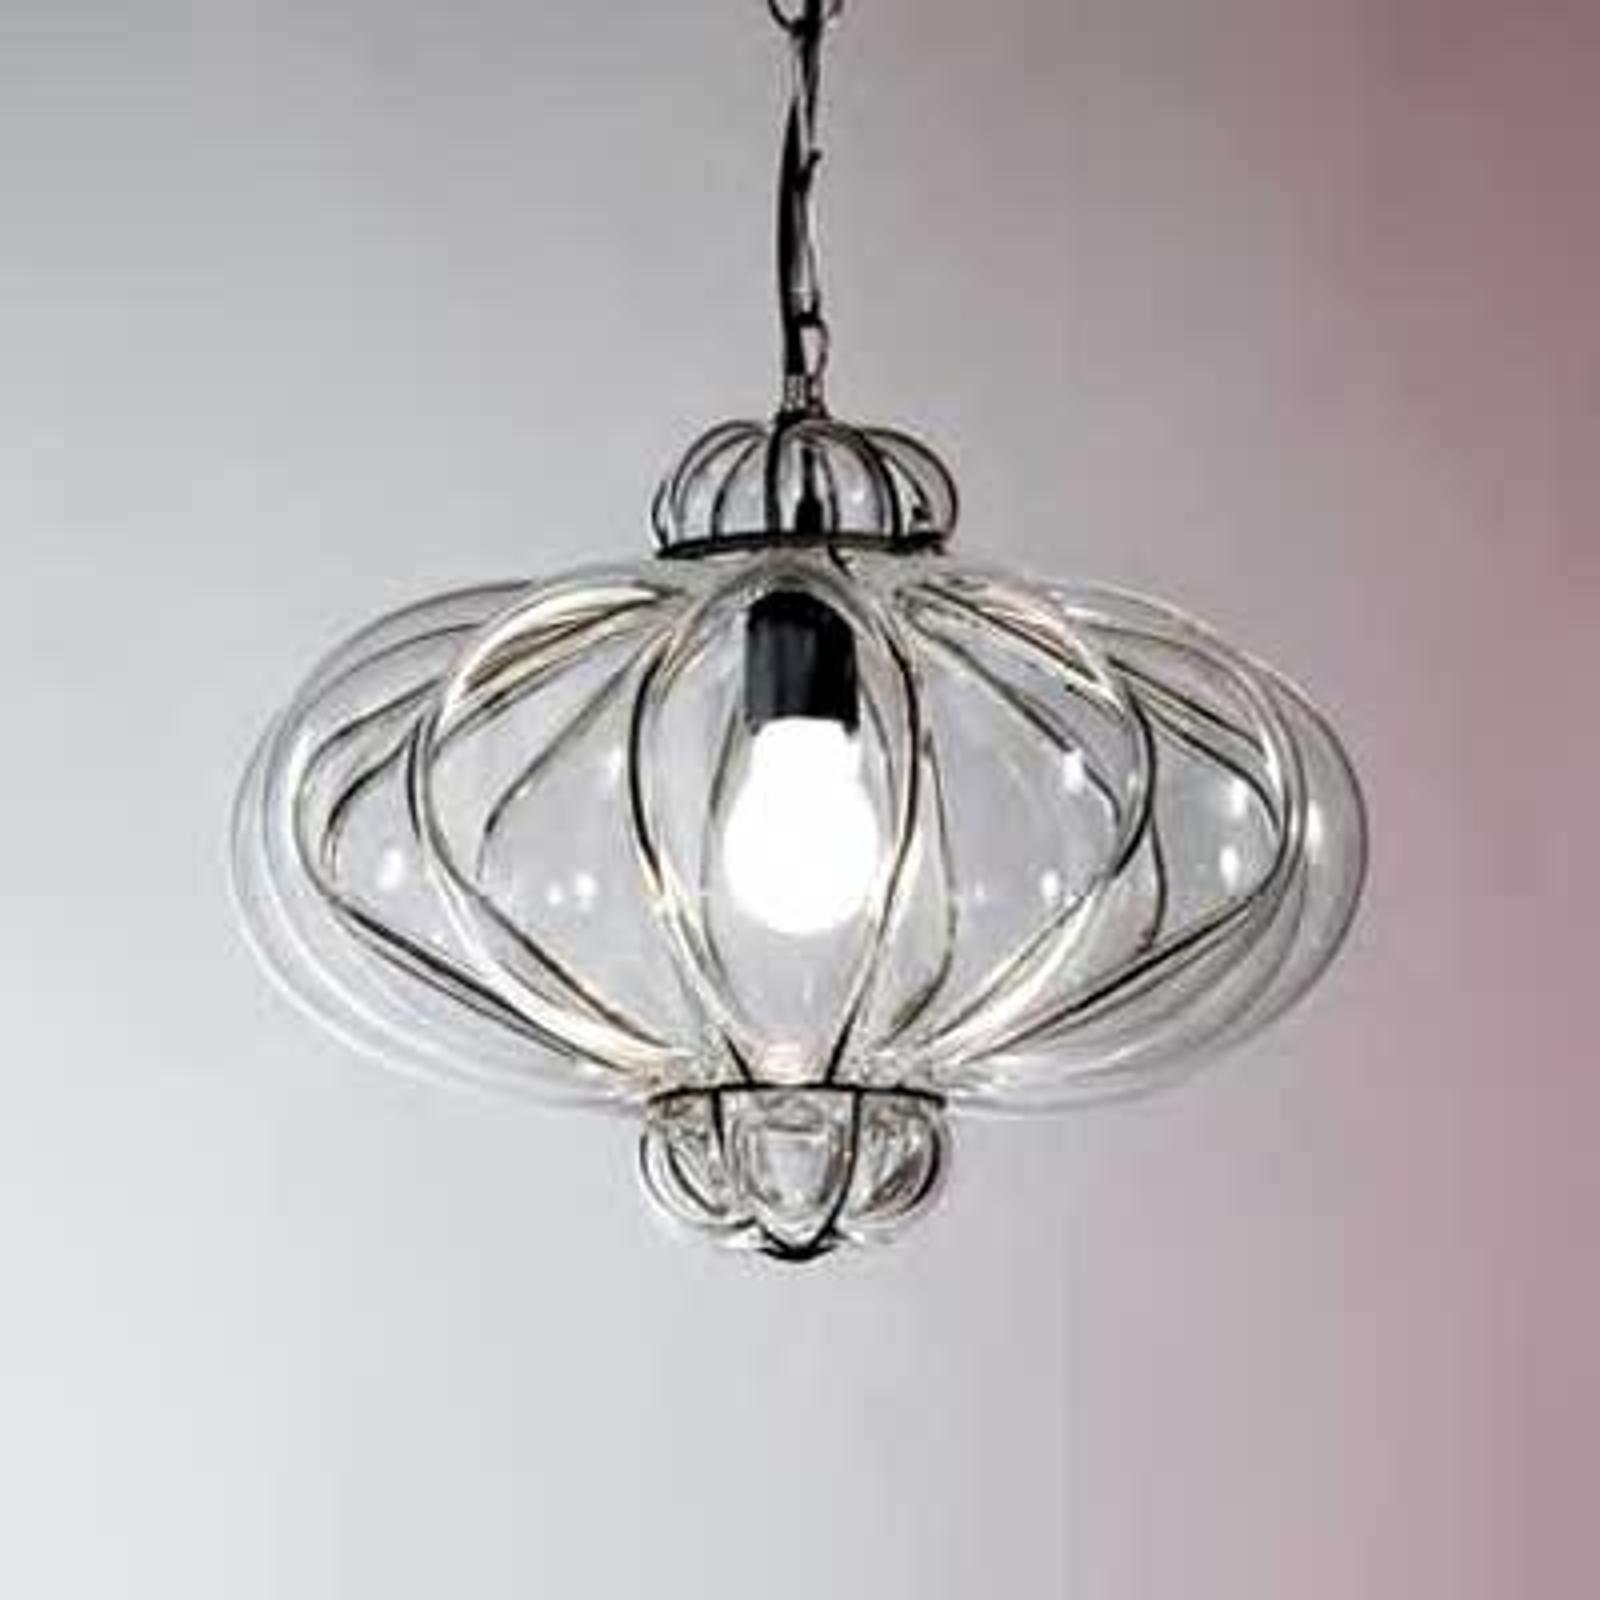 Klasyczna lampa wisząca SULTANO 37 cm